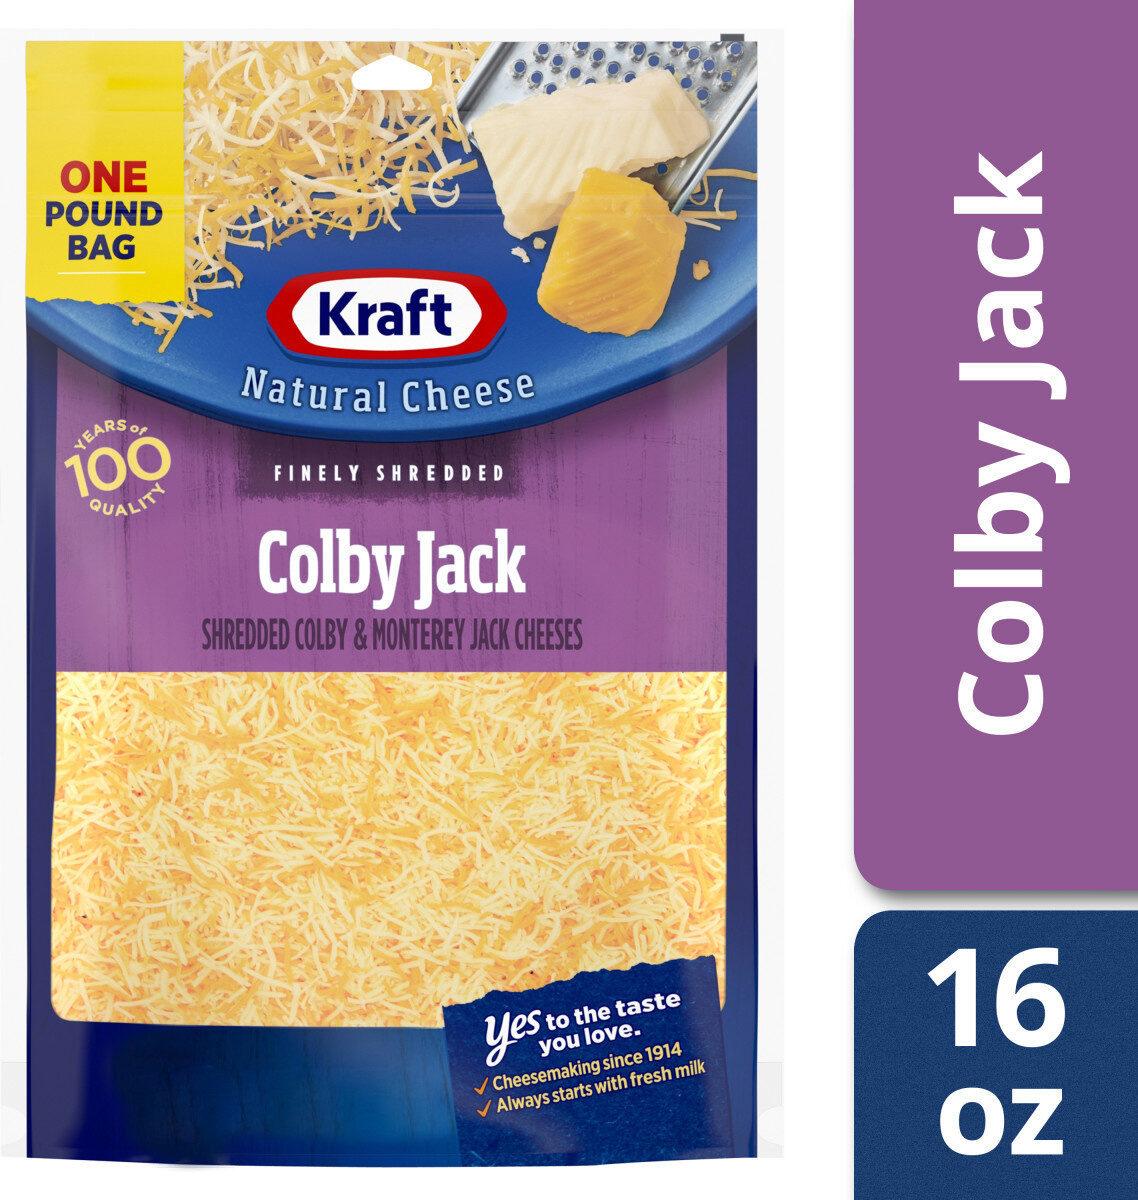 Colby & monterey jack cheeses - Produit - en